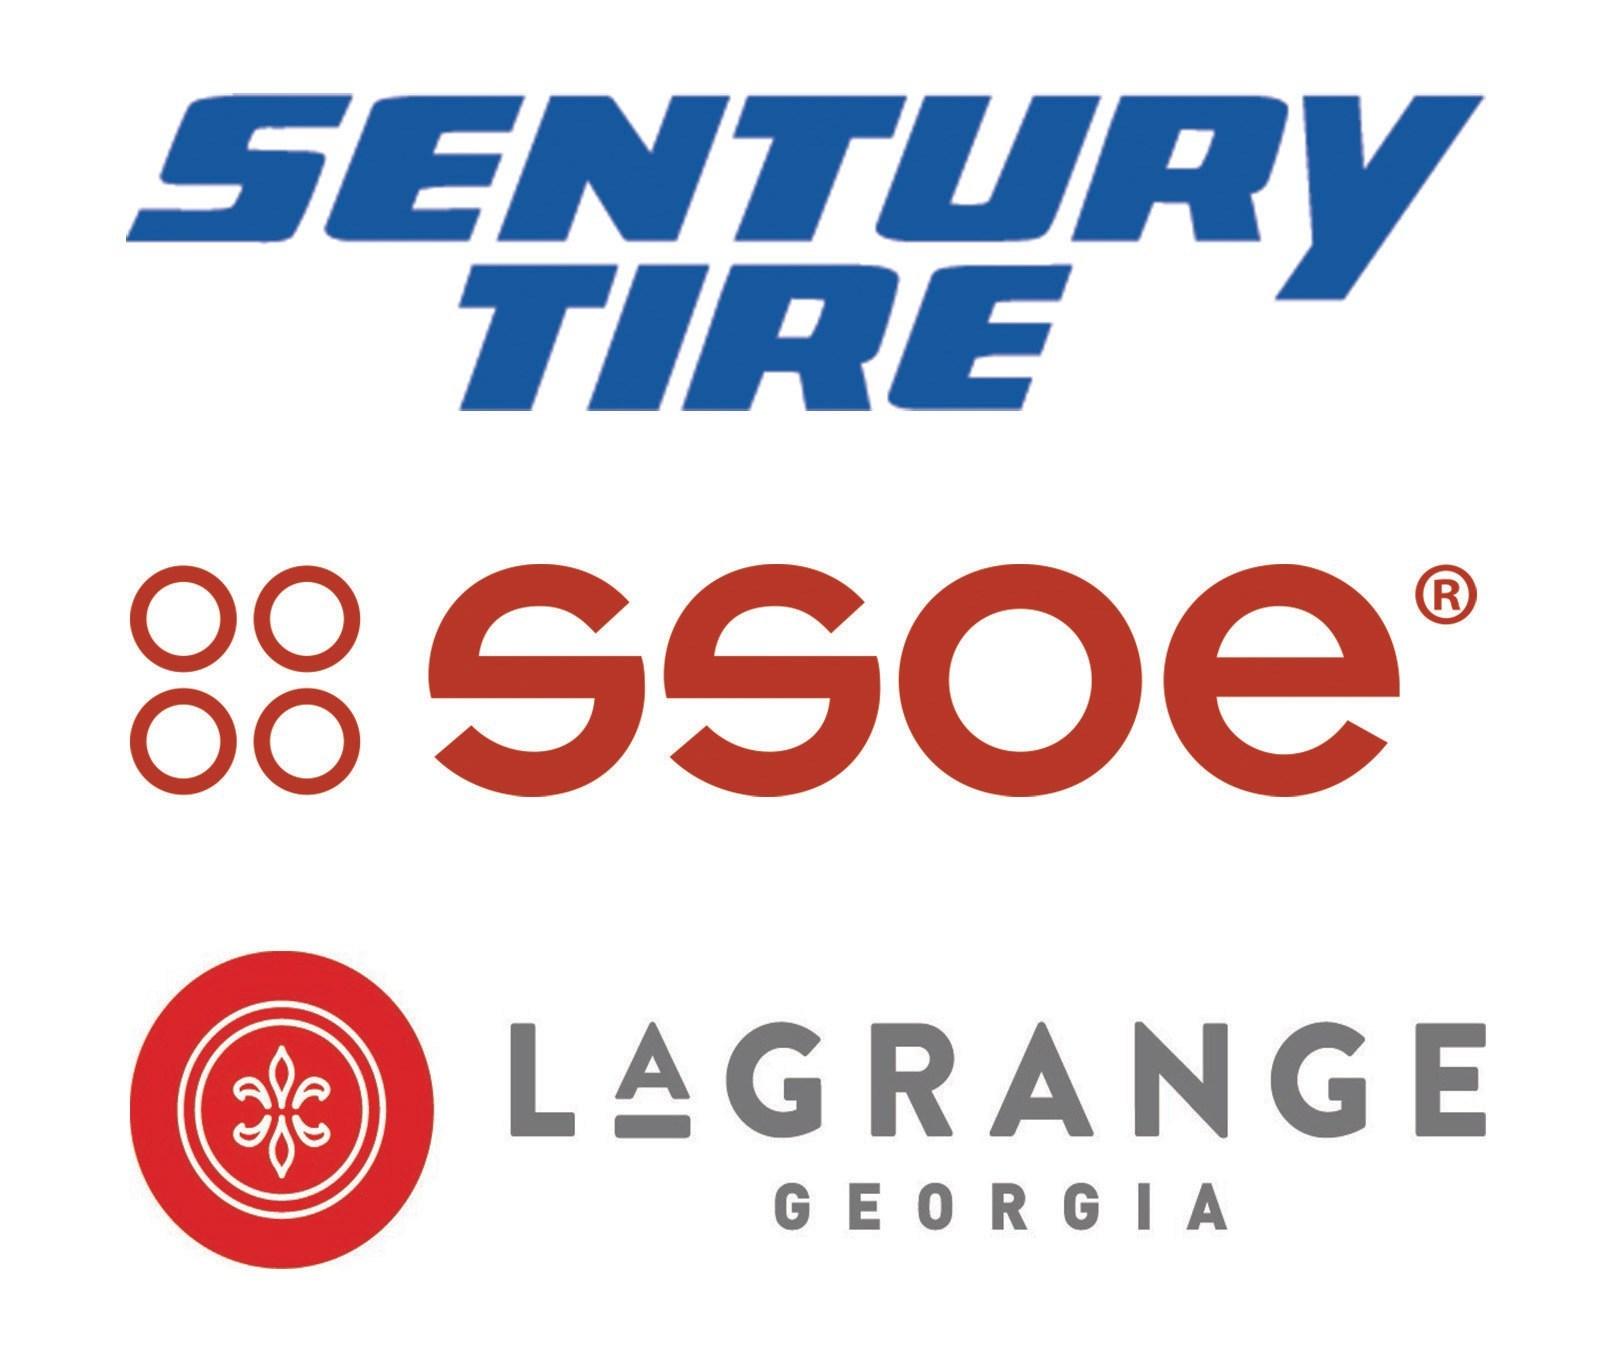 Sentury Tire Picks Ssoe Group To Design Its Tire Facility In Georgia